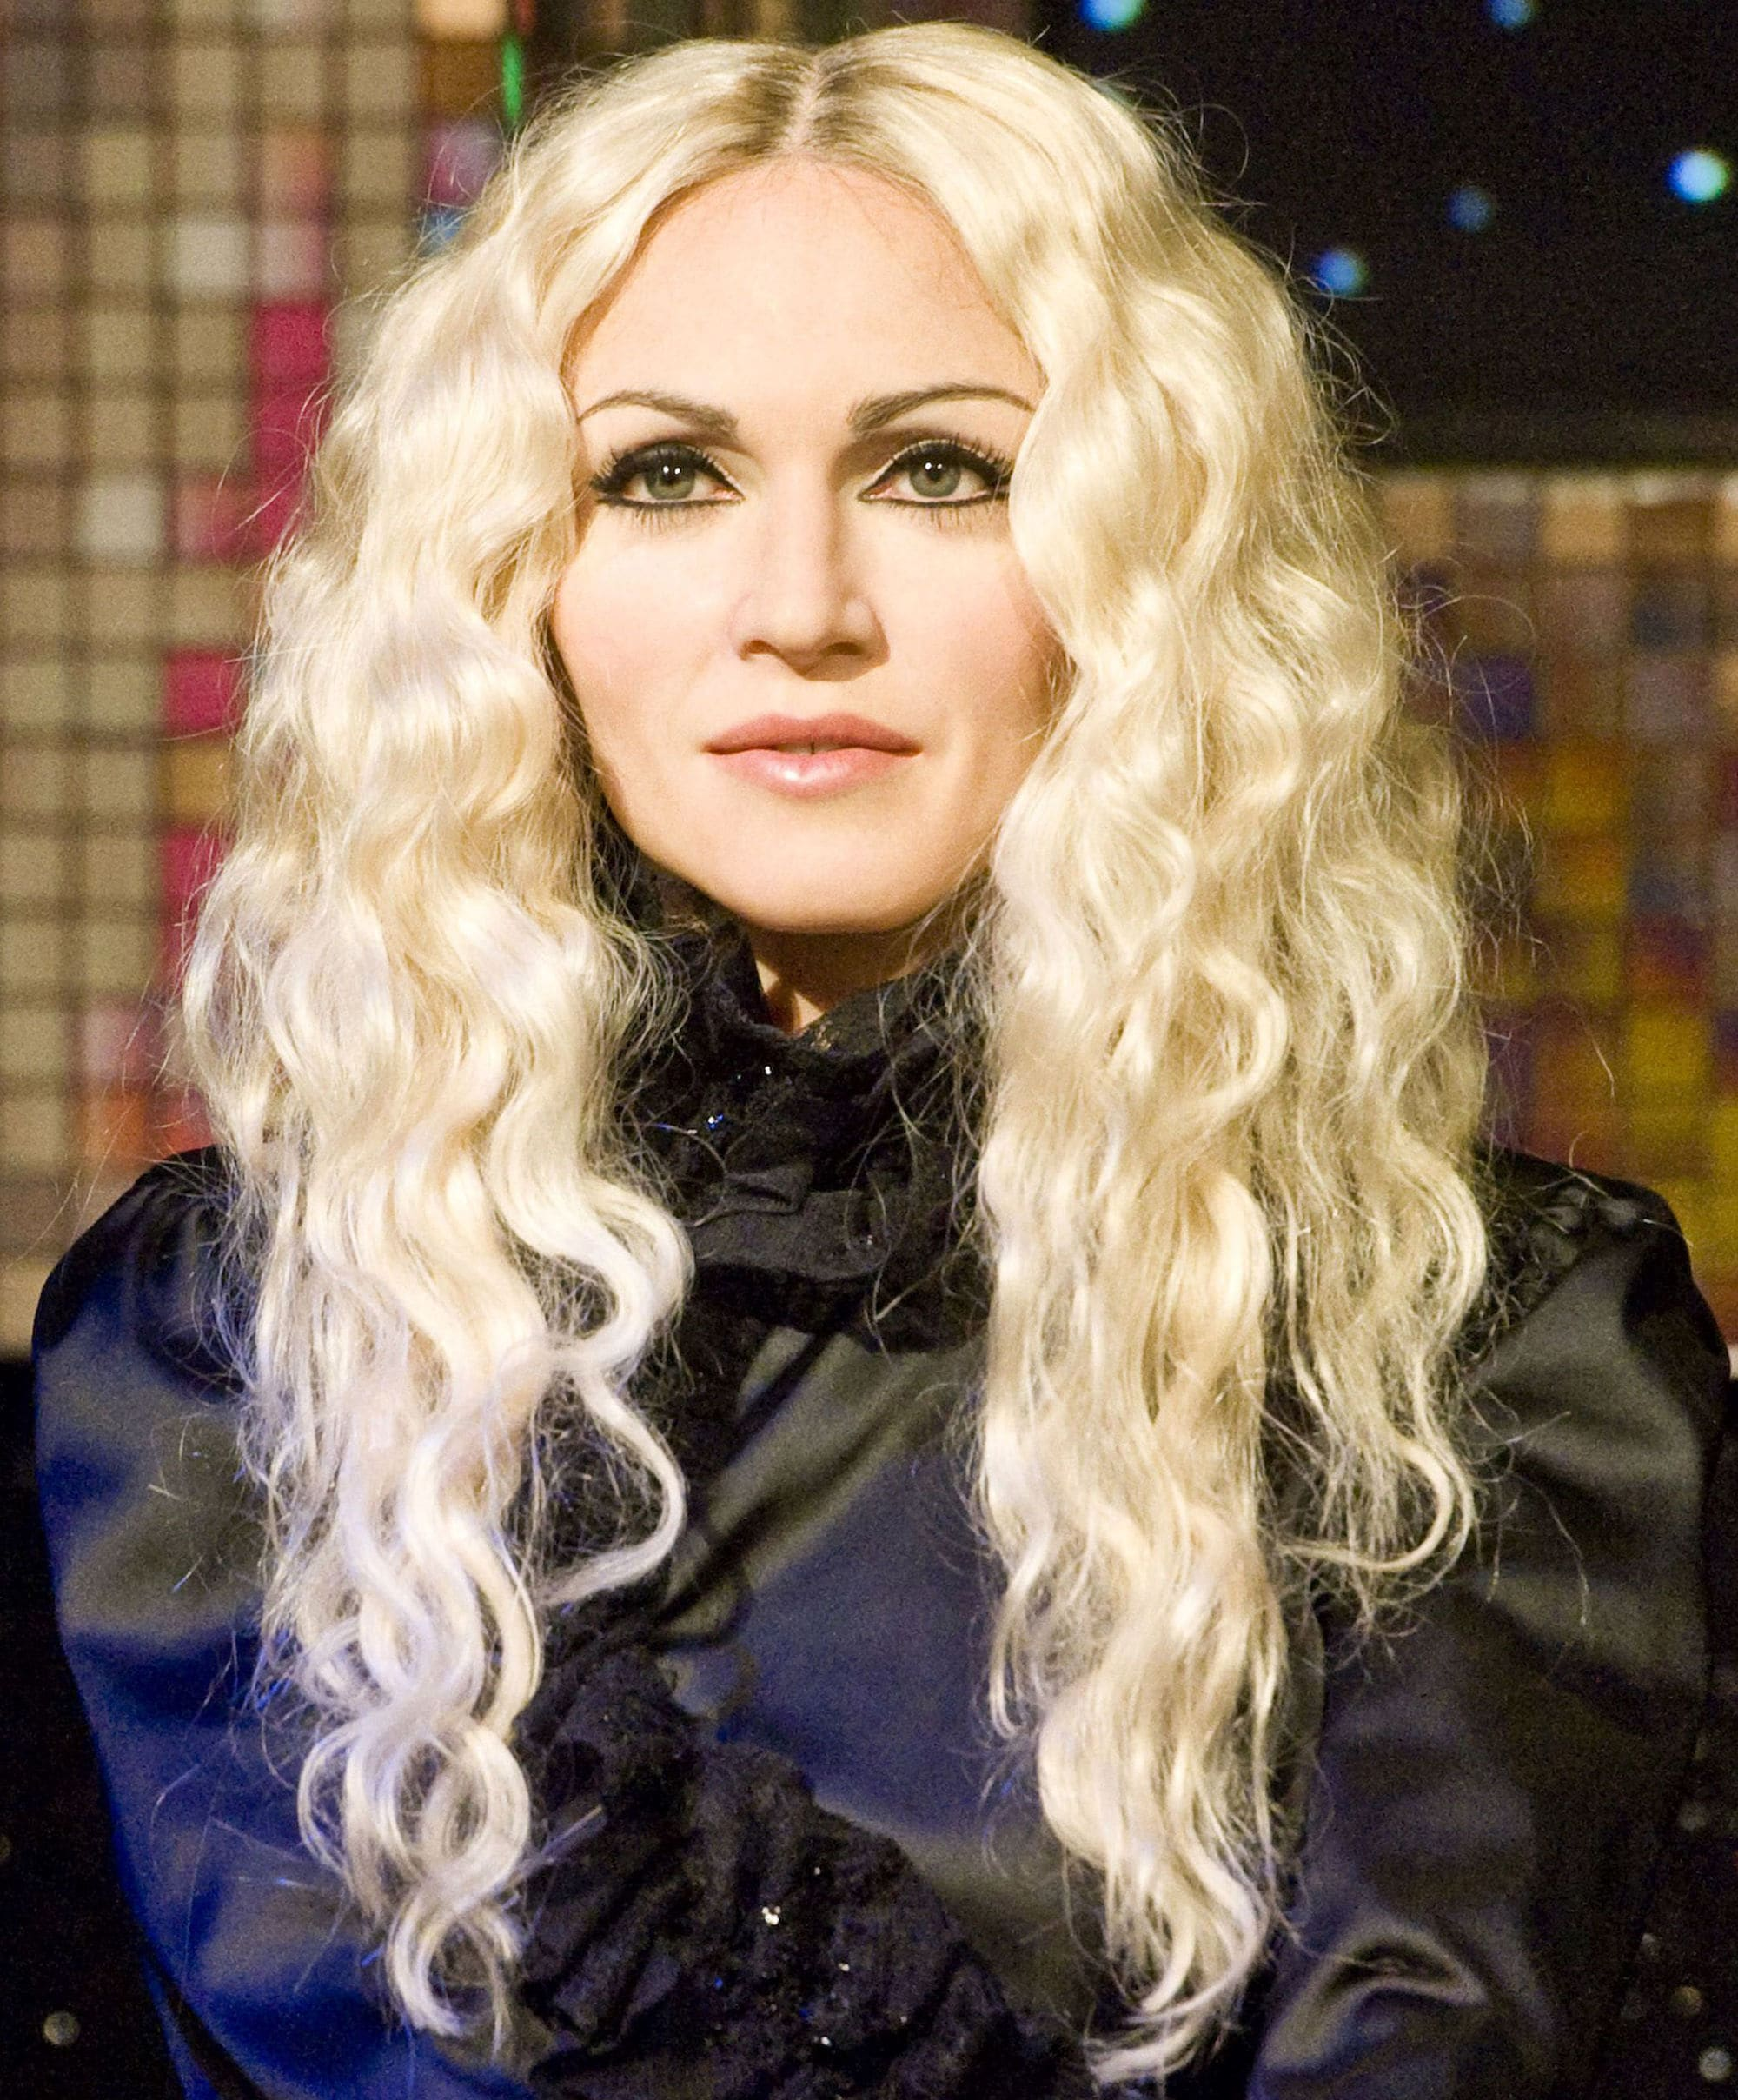 Madonna con rubio platinado con ondas